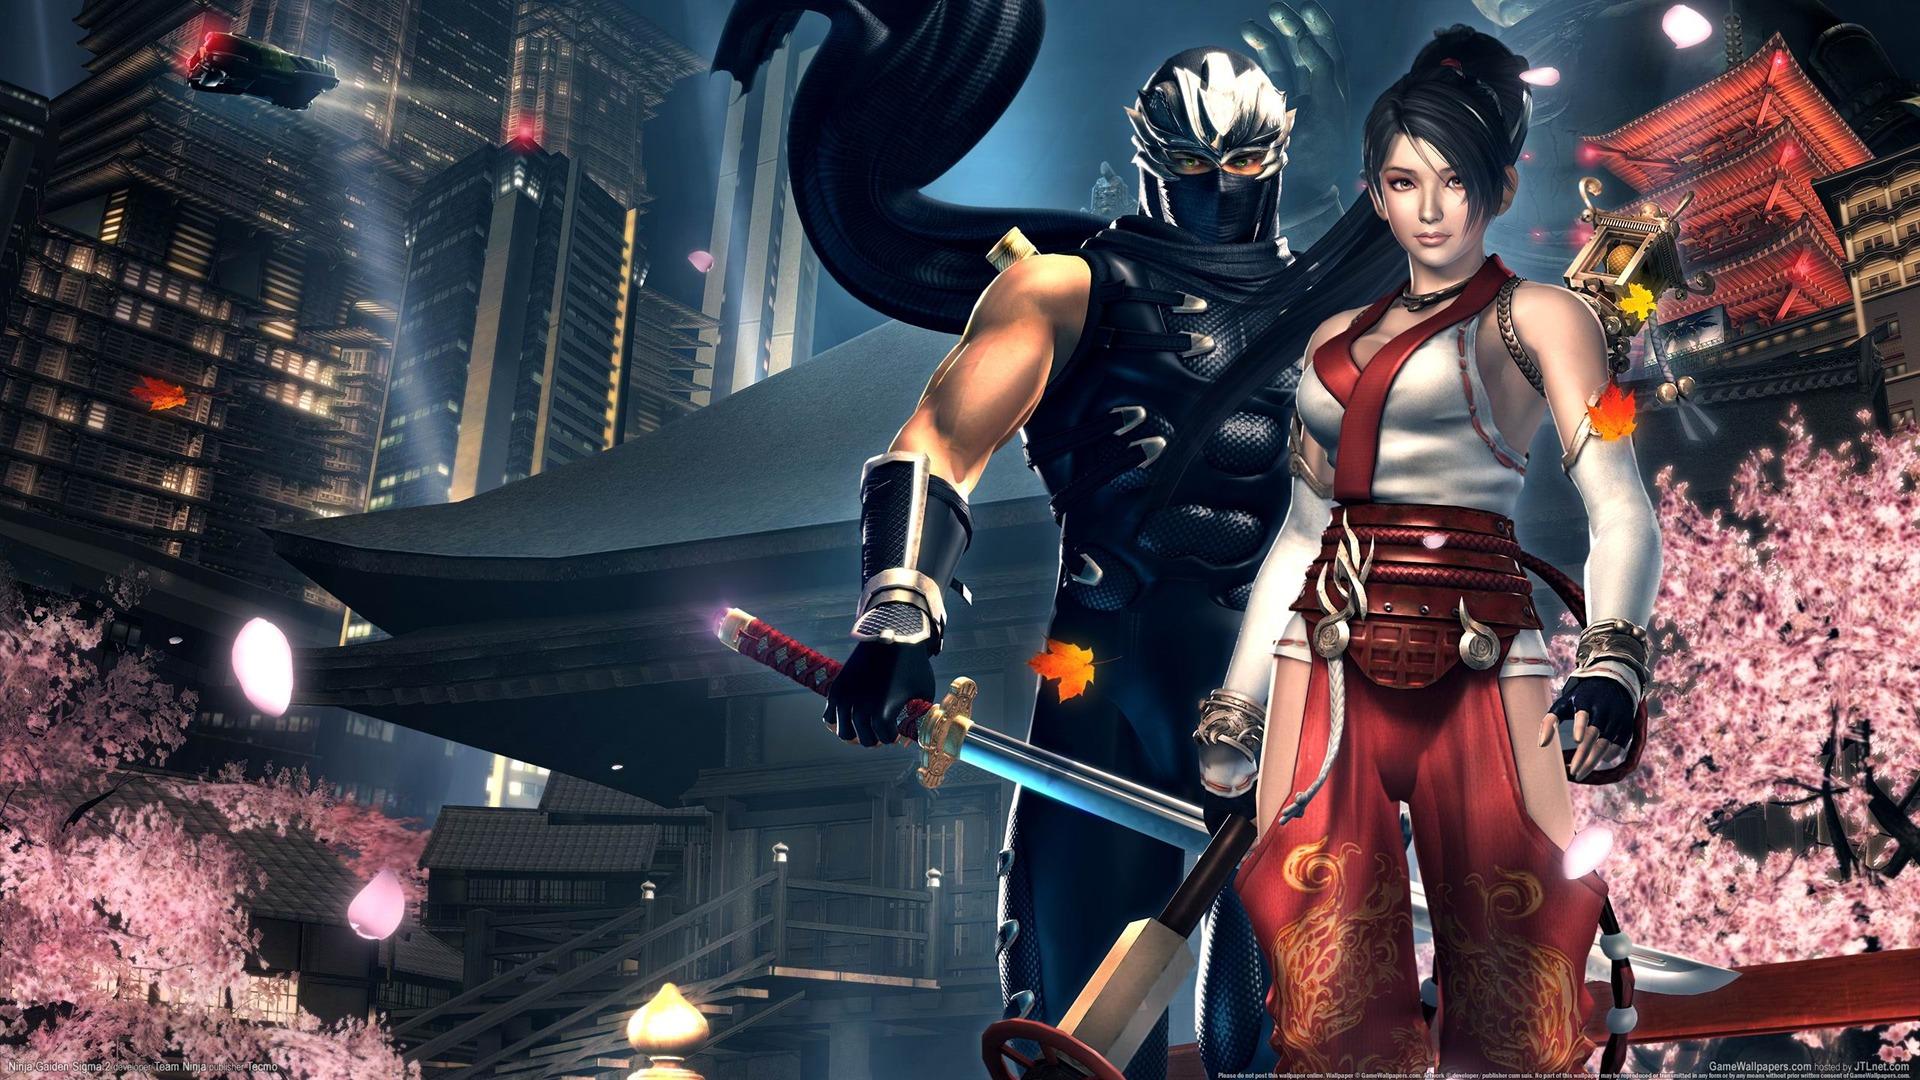 ninja gaiden 3 game hd wallpaper 07 preview | 10wallpaper